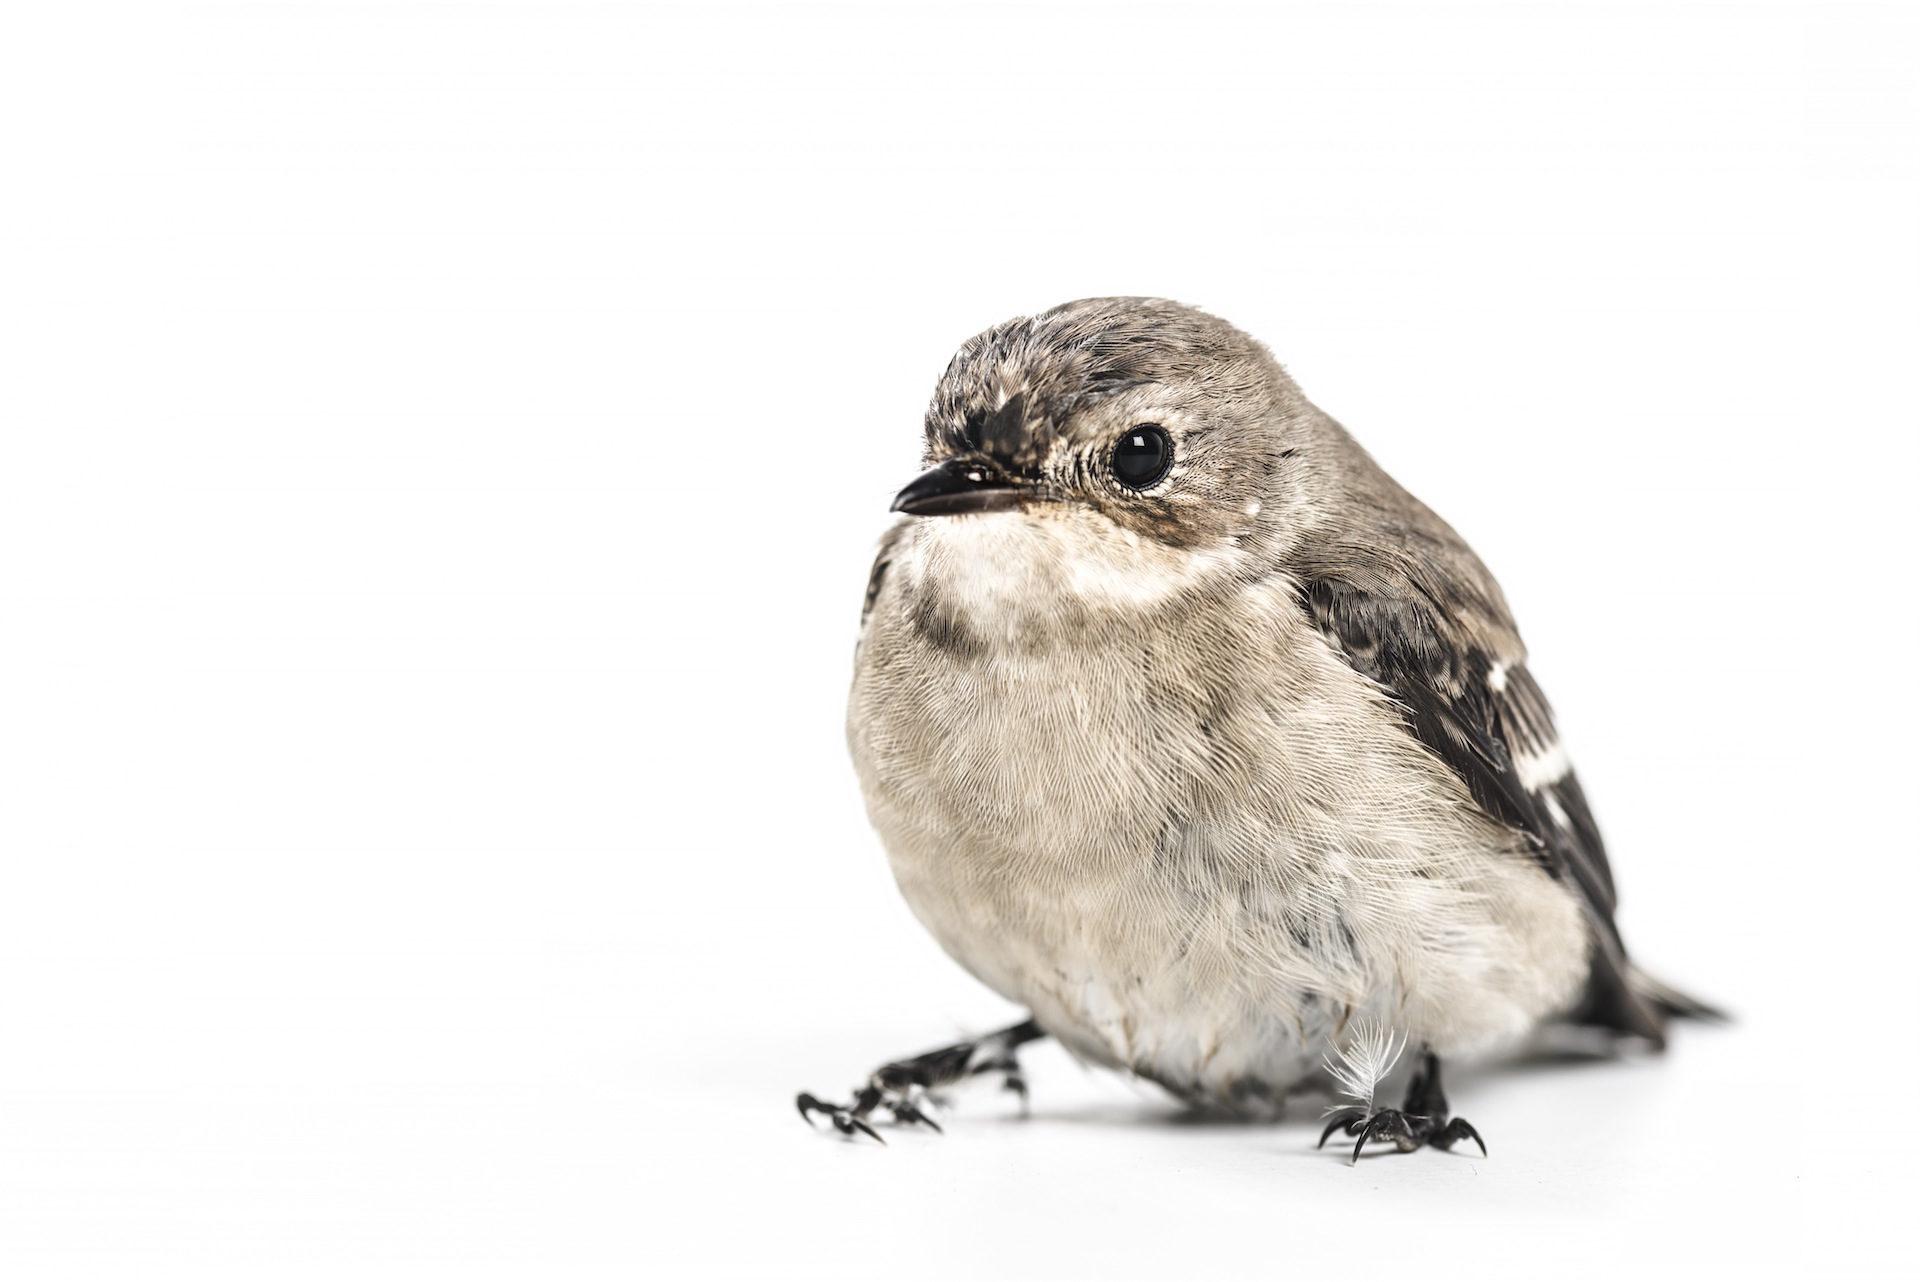 gorrión, pájaro, mirada, ojos, plumaje - Fondos de Pantalla HD - professor-falken.com